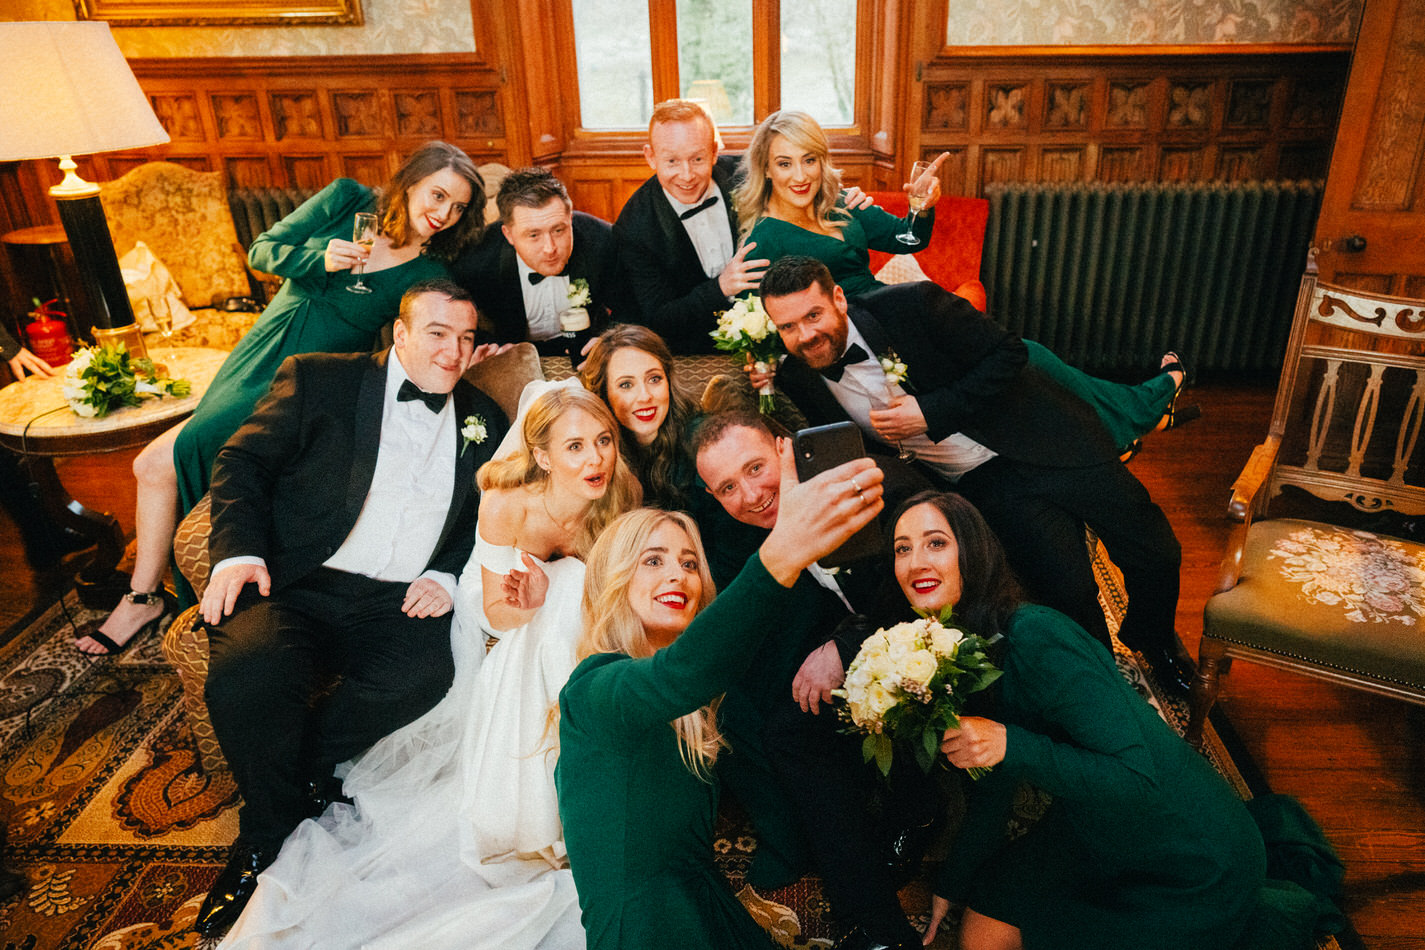 Castle-wedding-ireland-photos- 0249 187